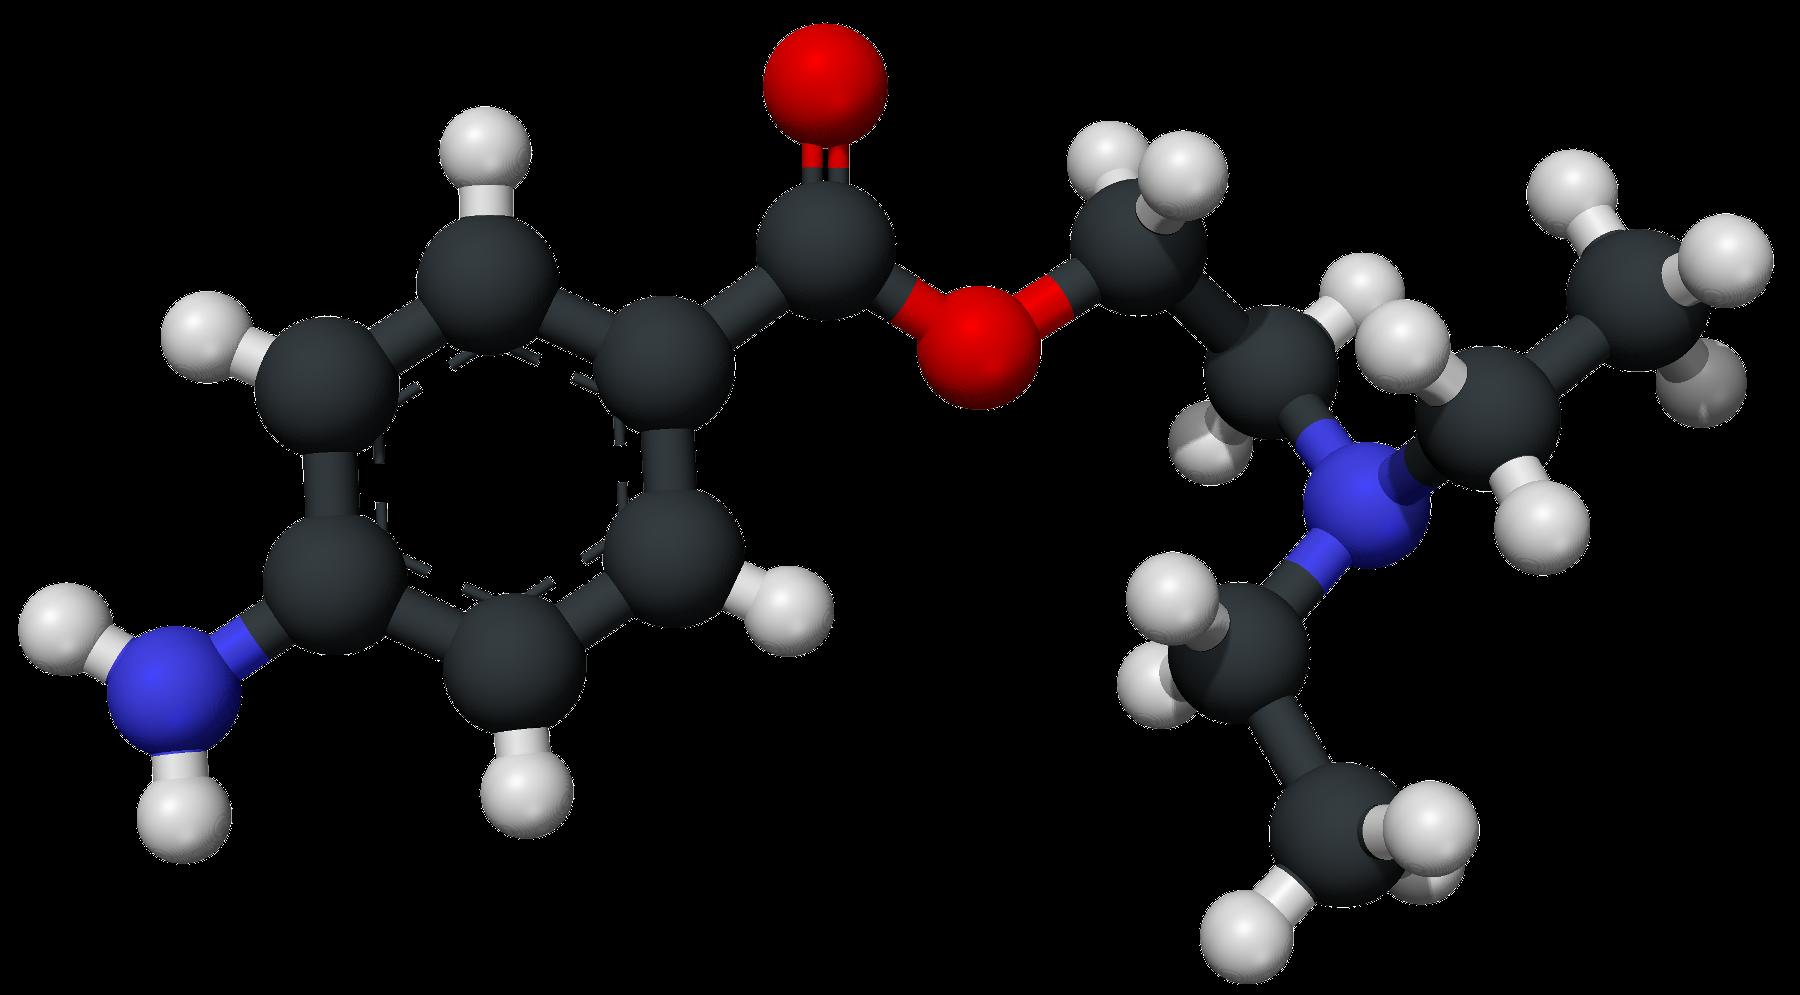 procaie novocain molecular structure